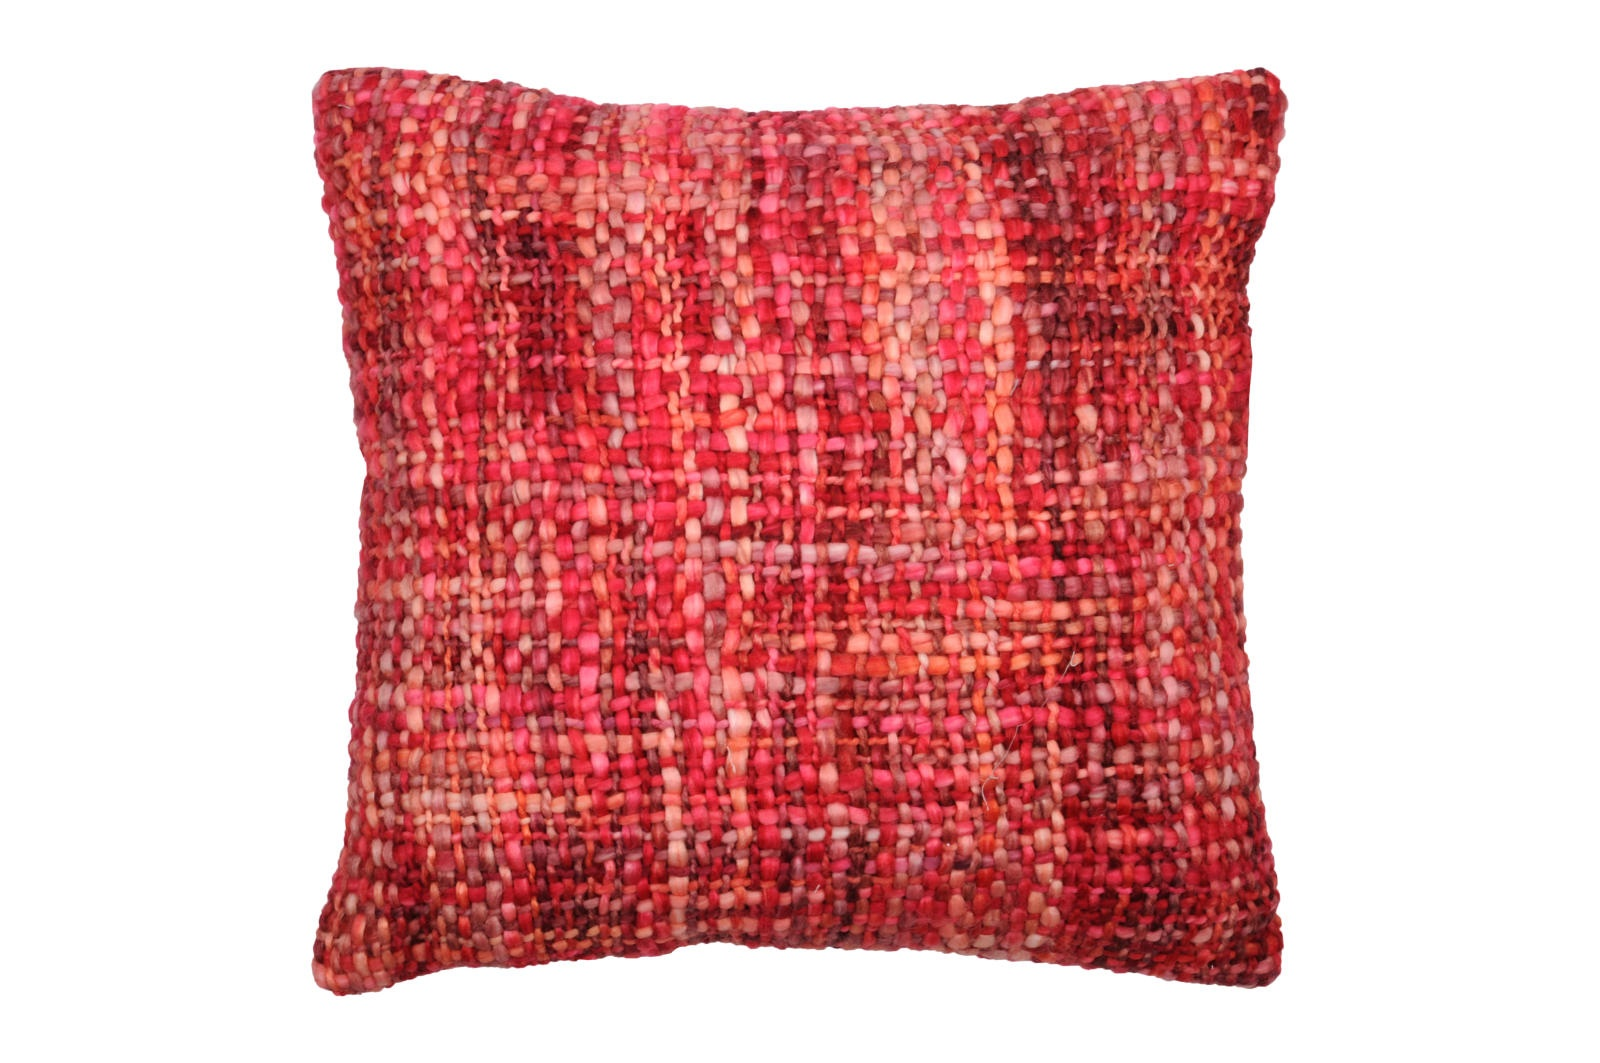 coussin grosses mailles rouge bleu bleu canard gris homemaison vente en ligne. Black Bedroom Furniture Sets. Home Design Ideas